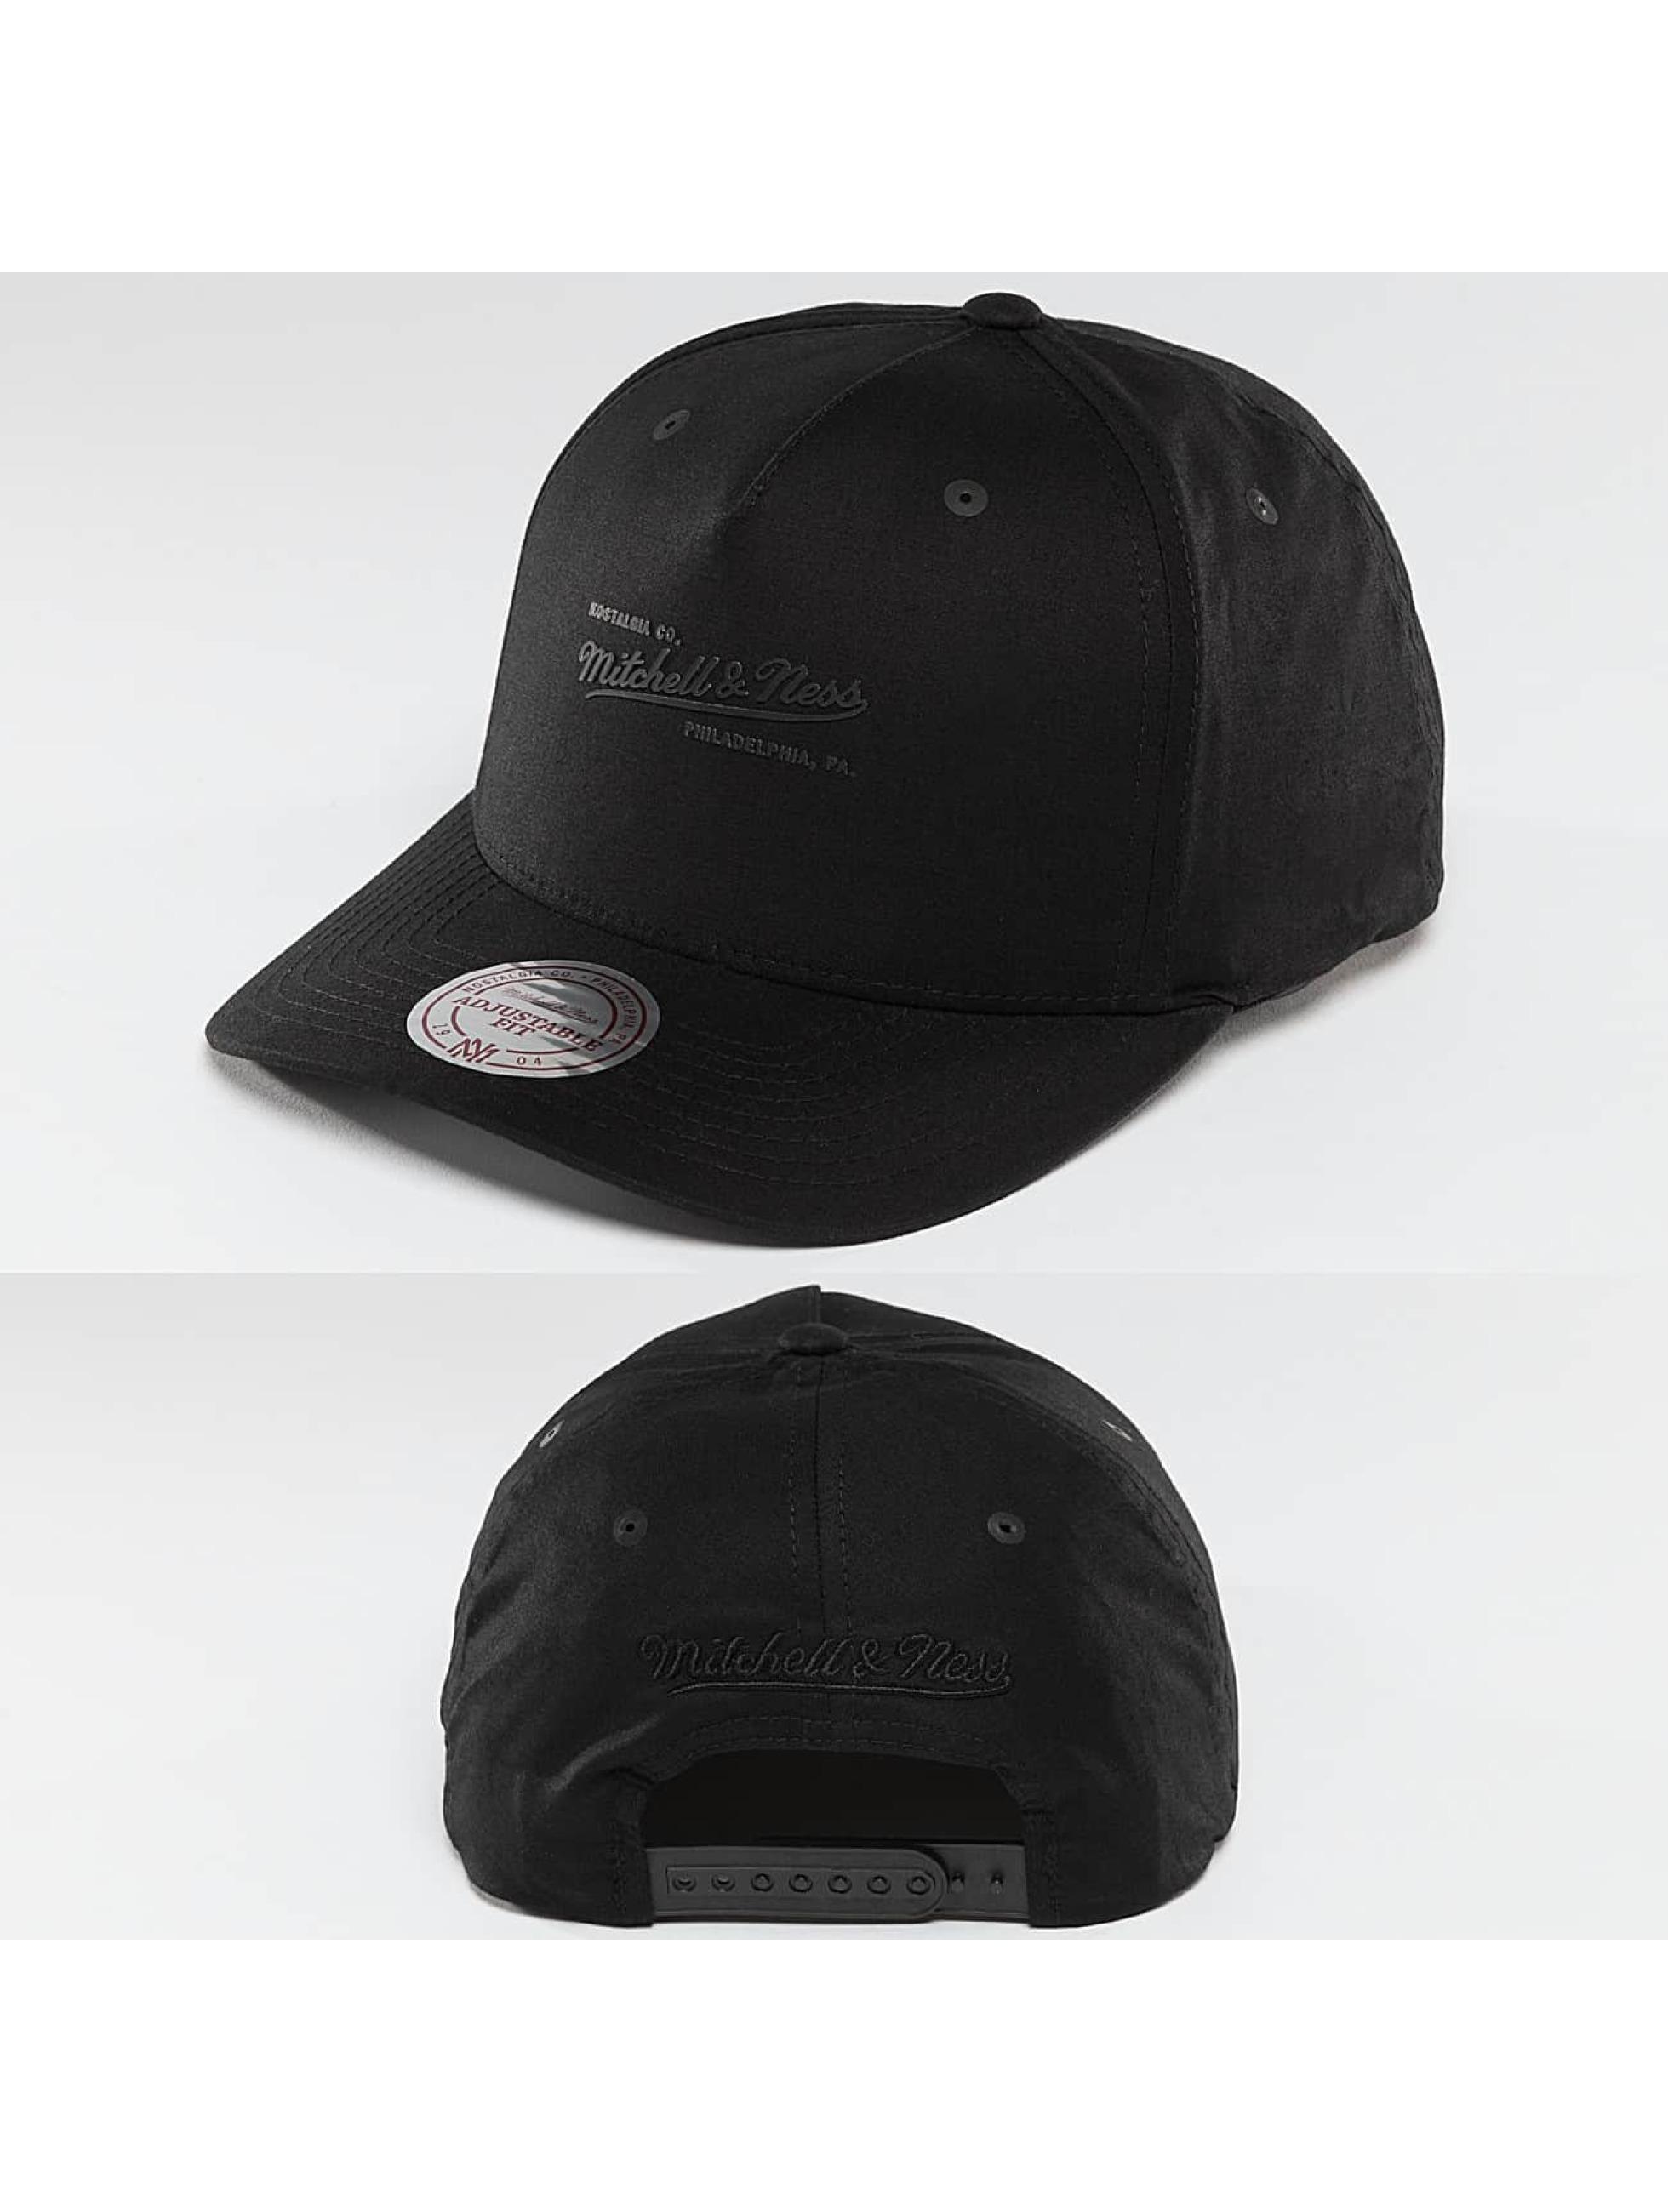 Mitchell & Ness Männer,Frauen Snapback Cap Tactical in schwarz